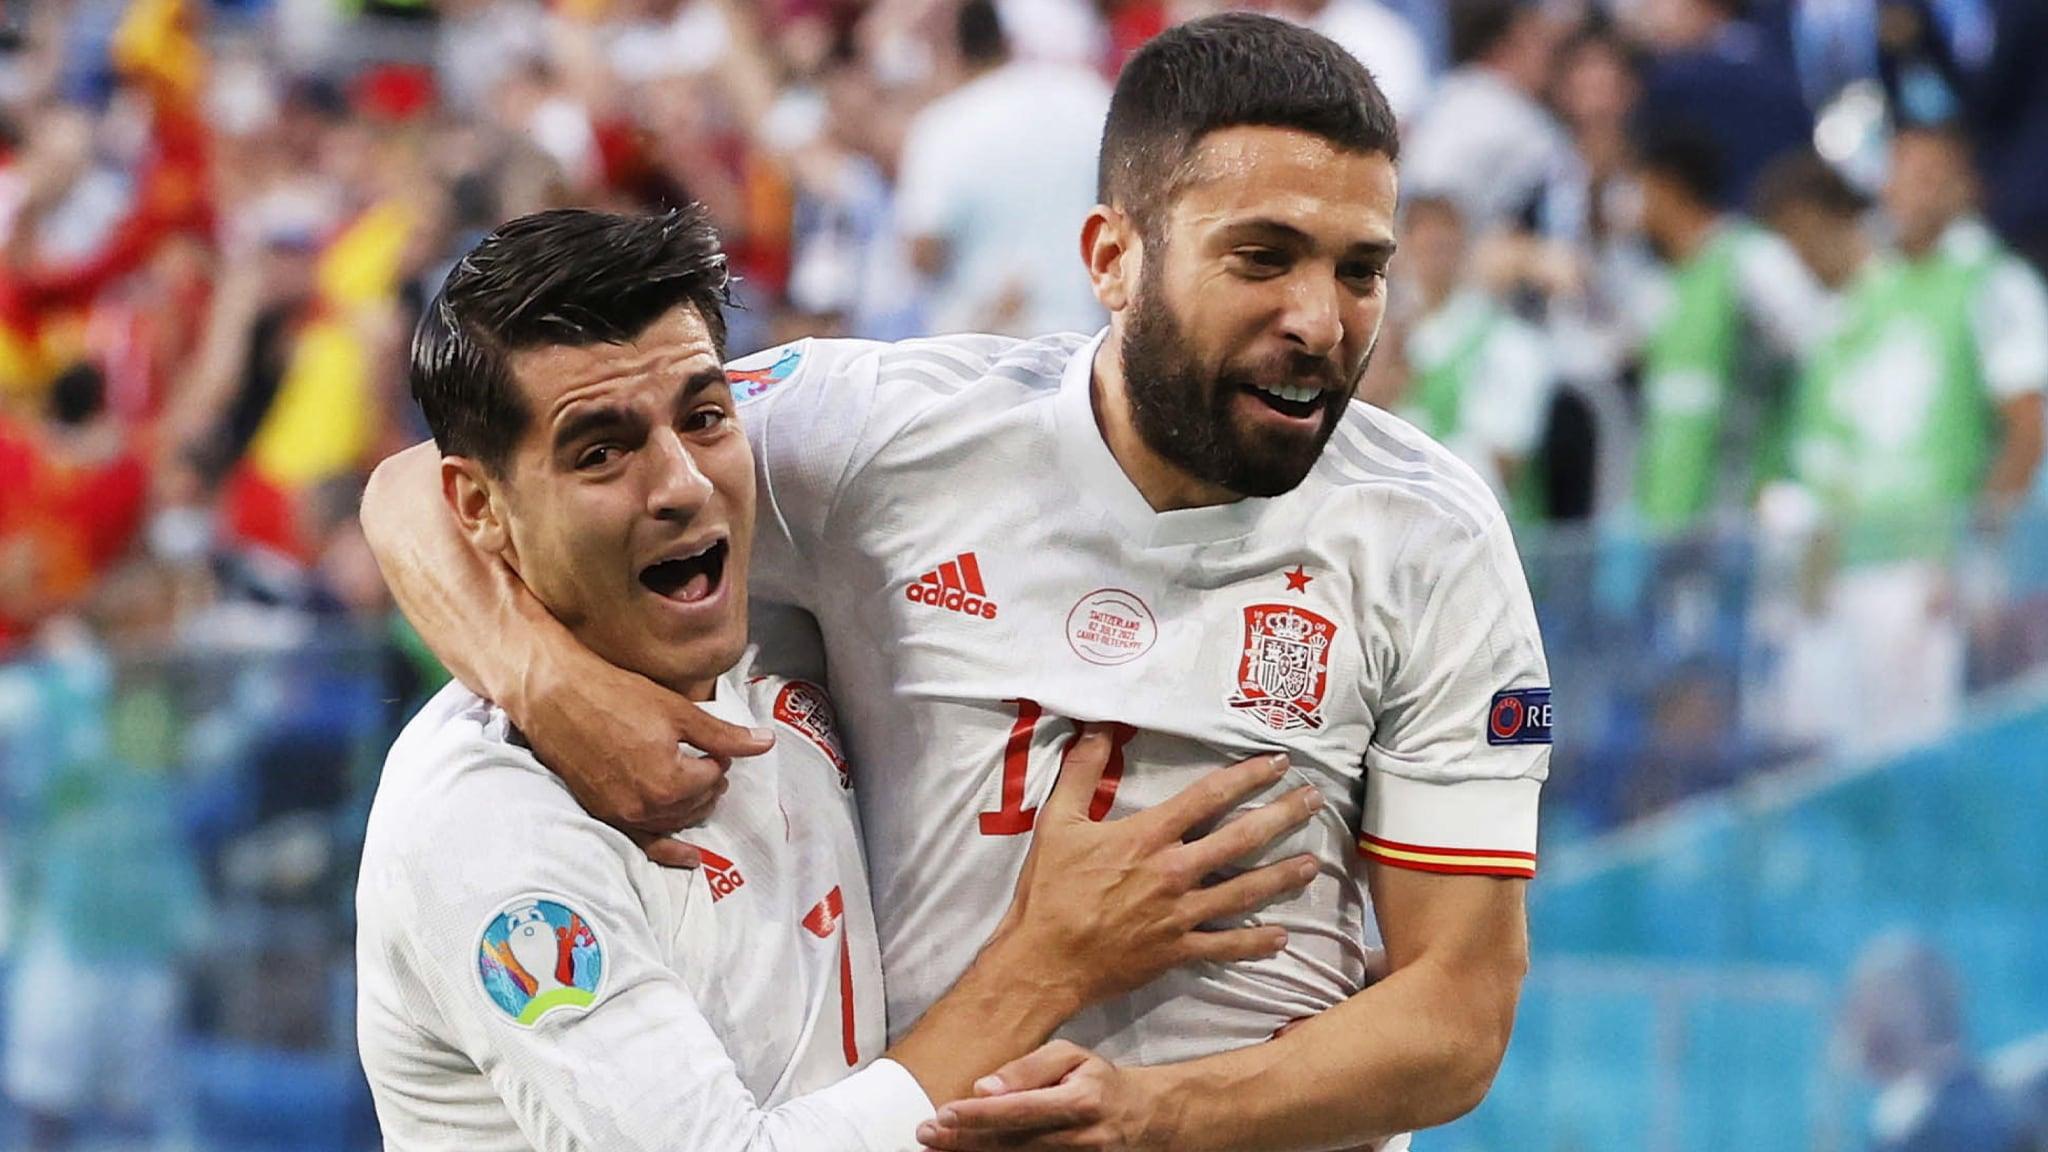 Euro 2020 - Svizzera - Spagna 2-4: la sintesi - Video - RaiPlay